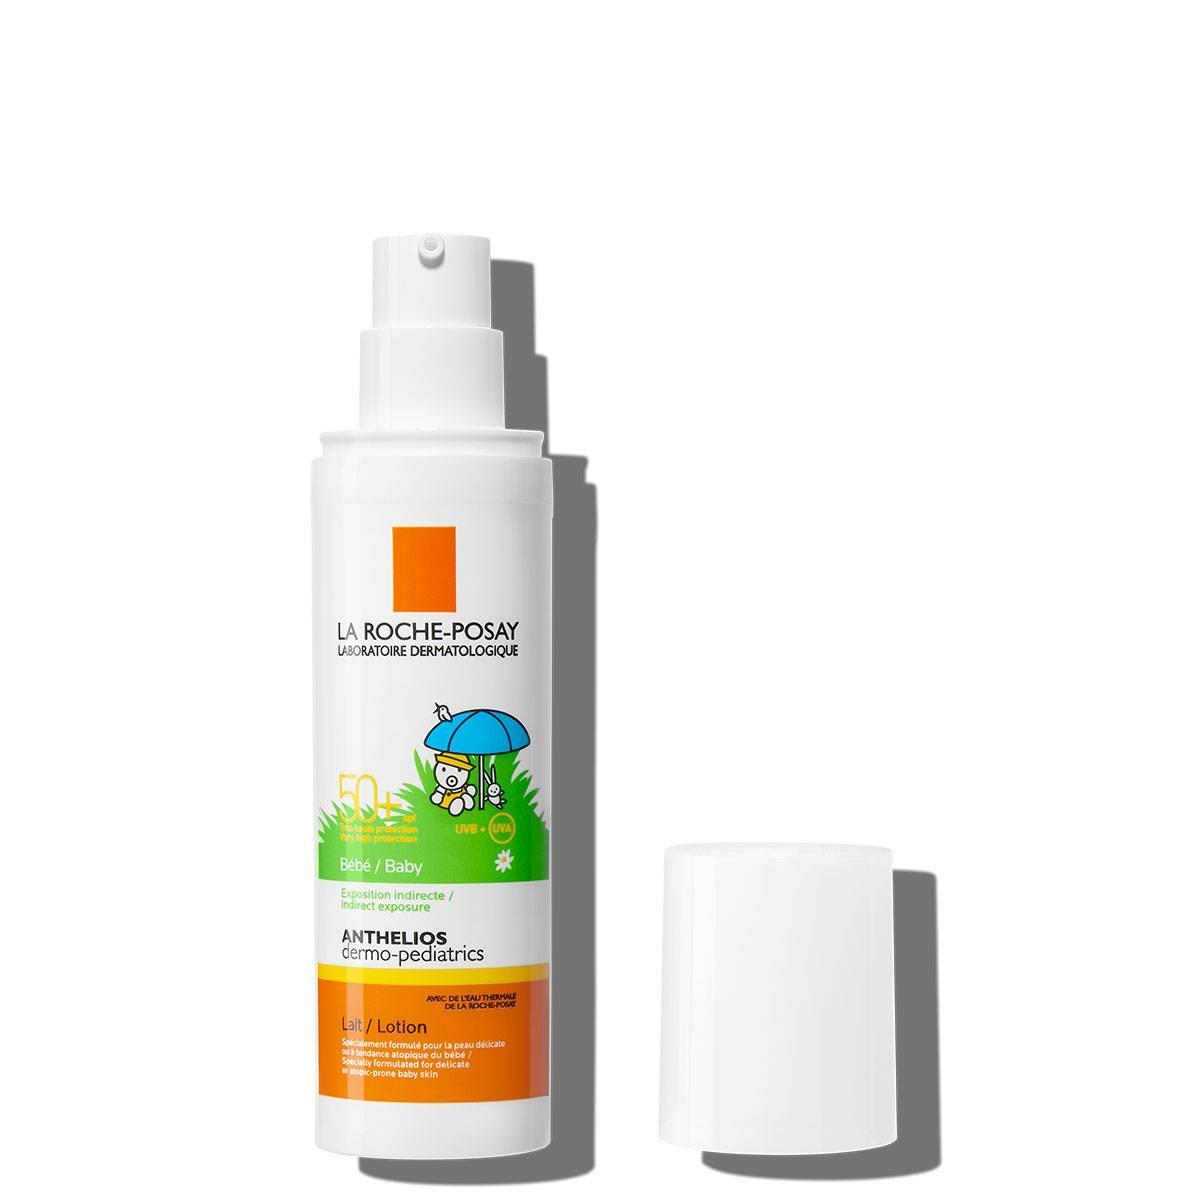 La Roche Posay Tuotesivu Aurinko Anthelios Dermo Pediatrics Spf50 50ml 3